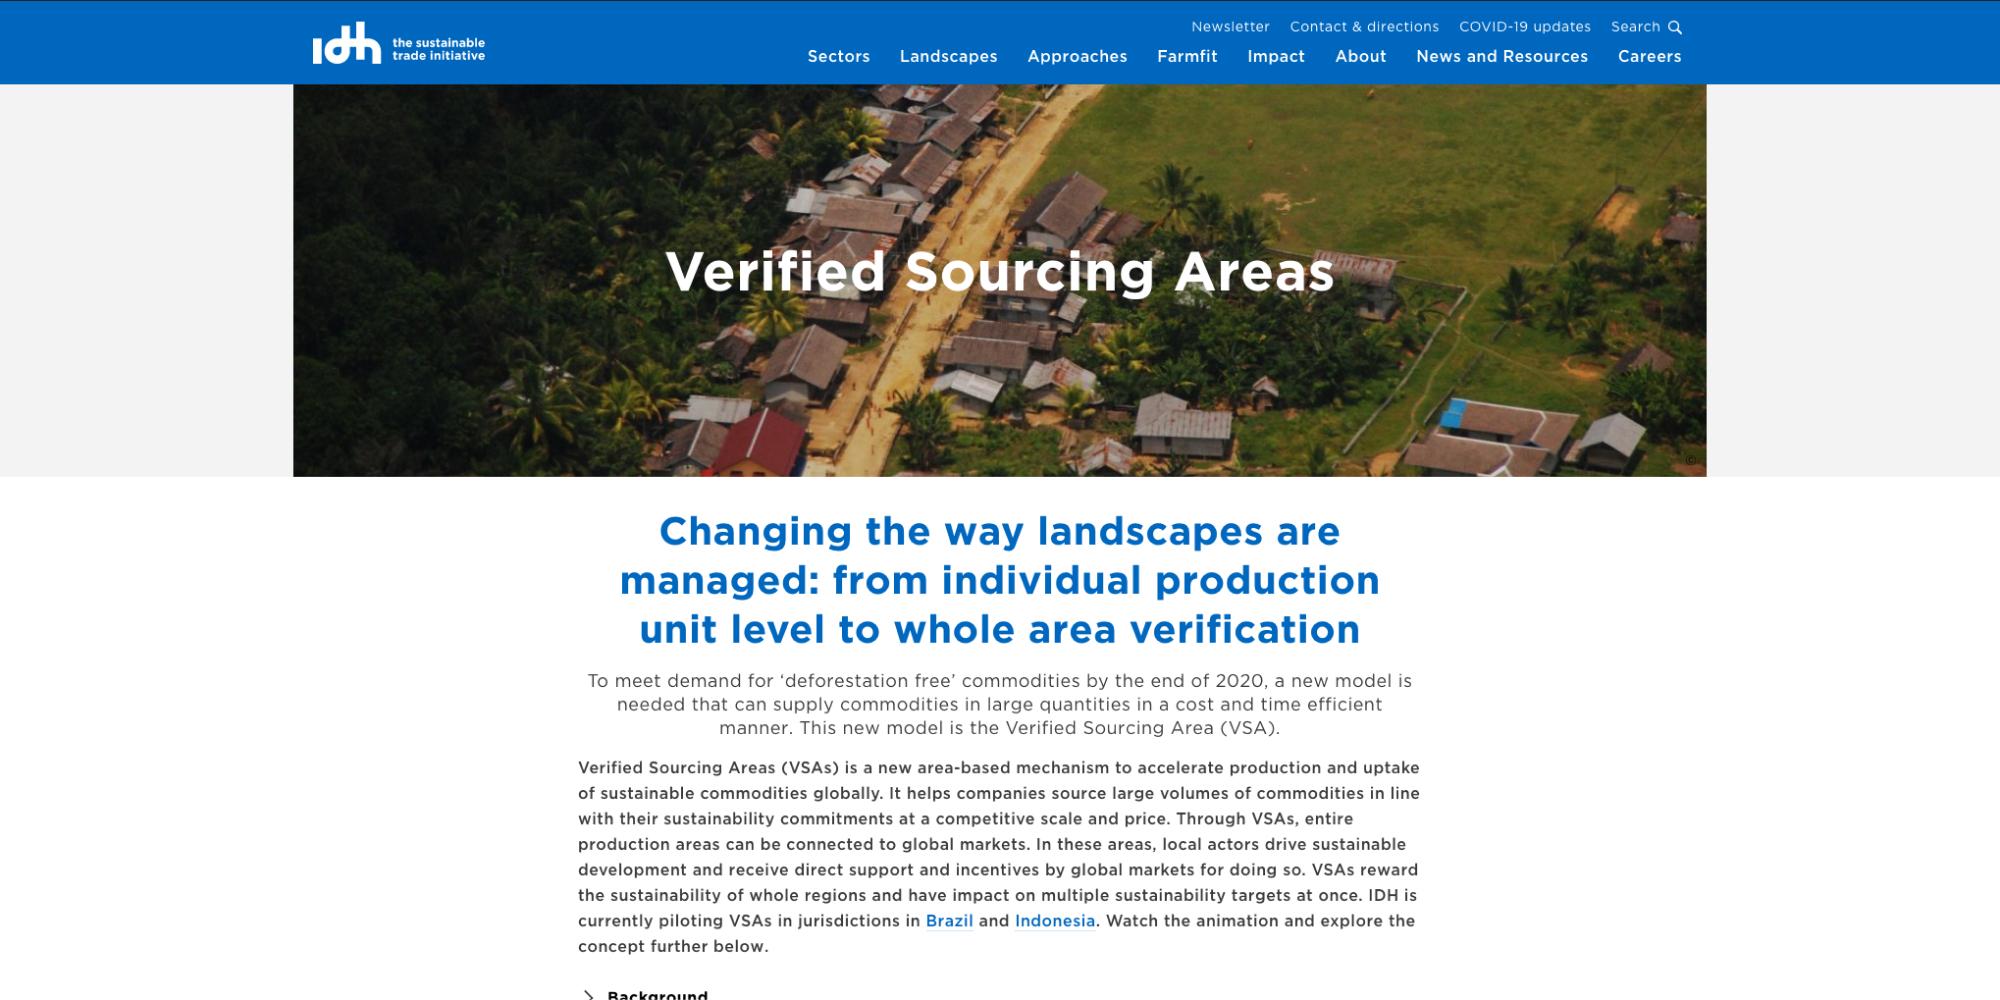 Img Verified Sourcing Areas (VSAs)